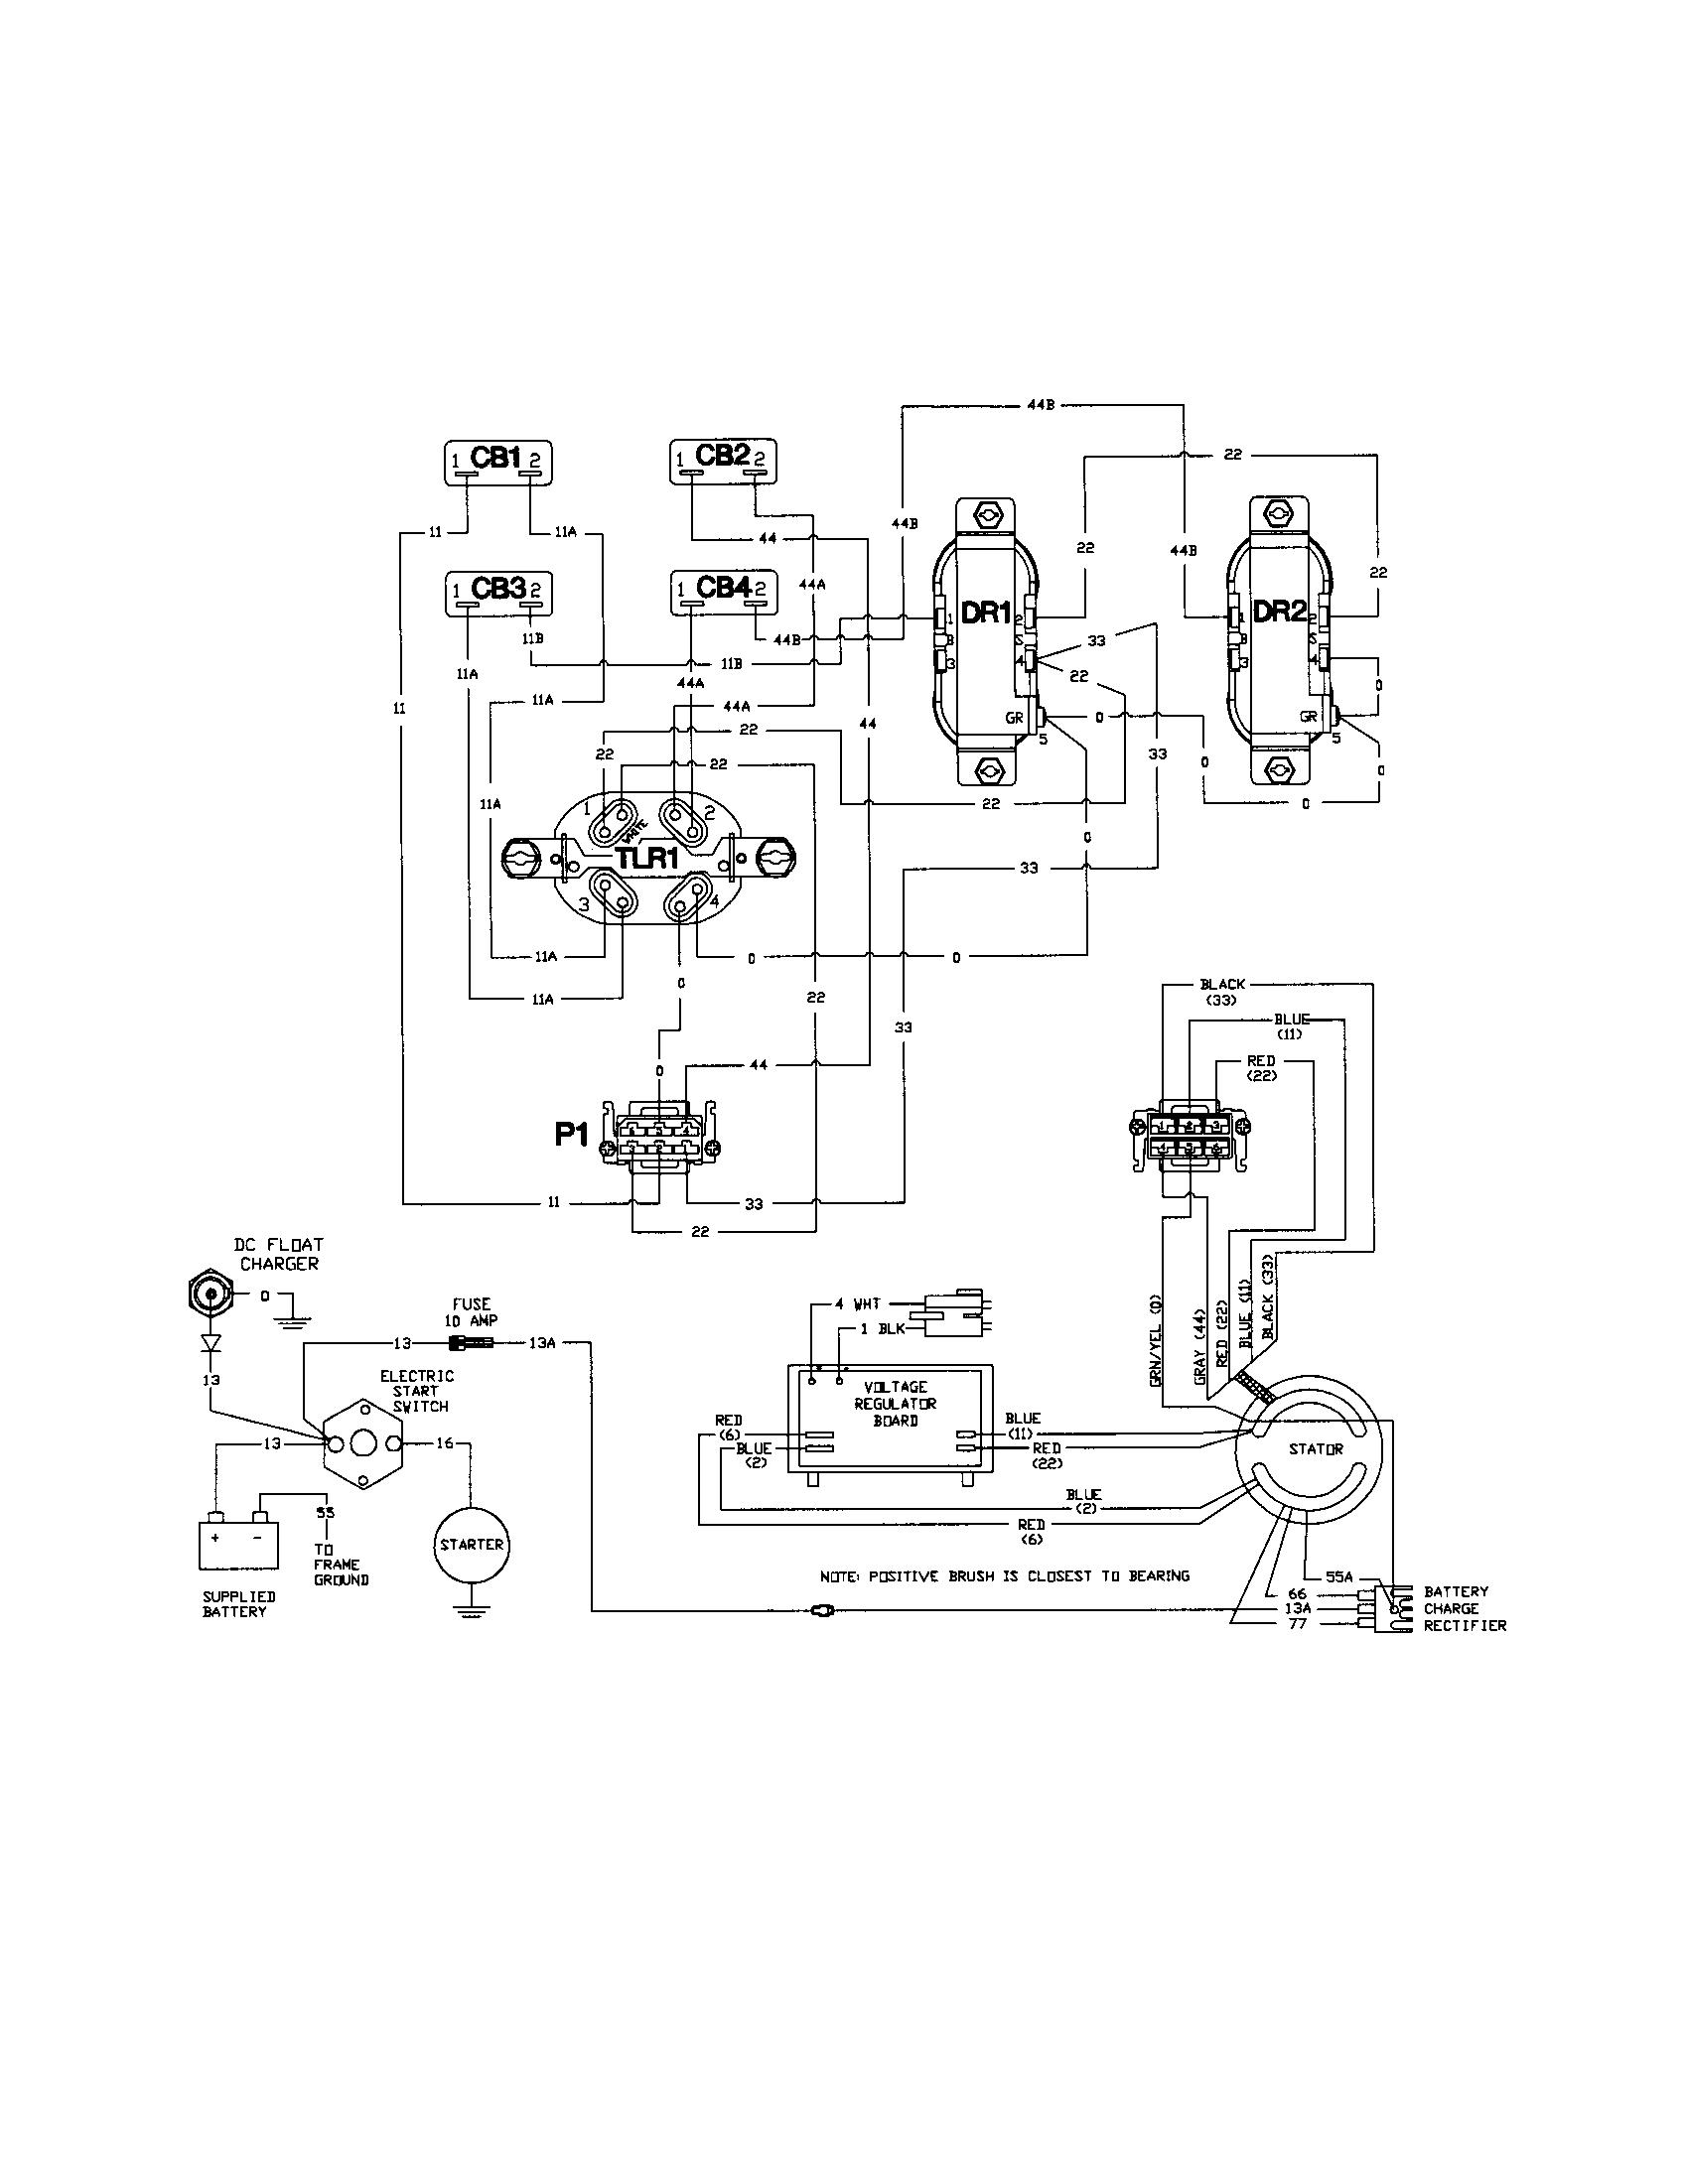 Wiring Diagram Ust 3500w Generator